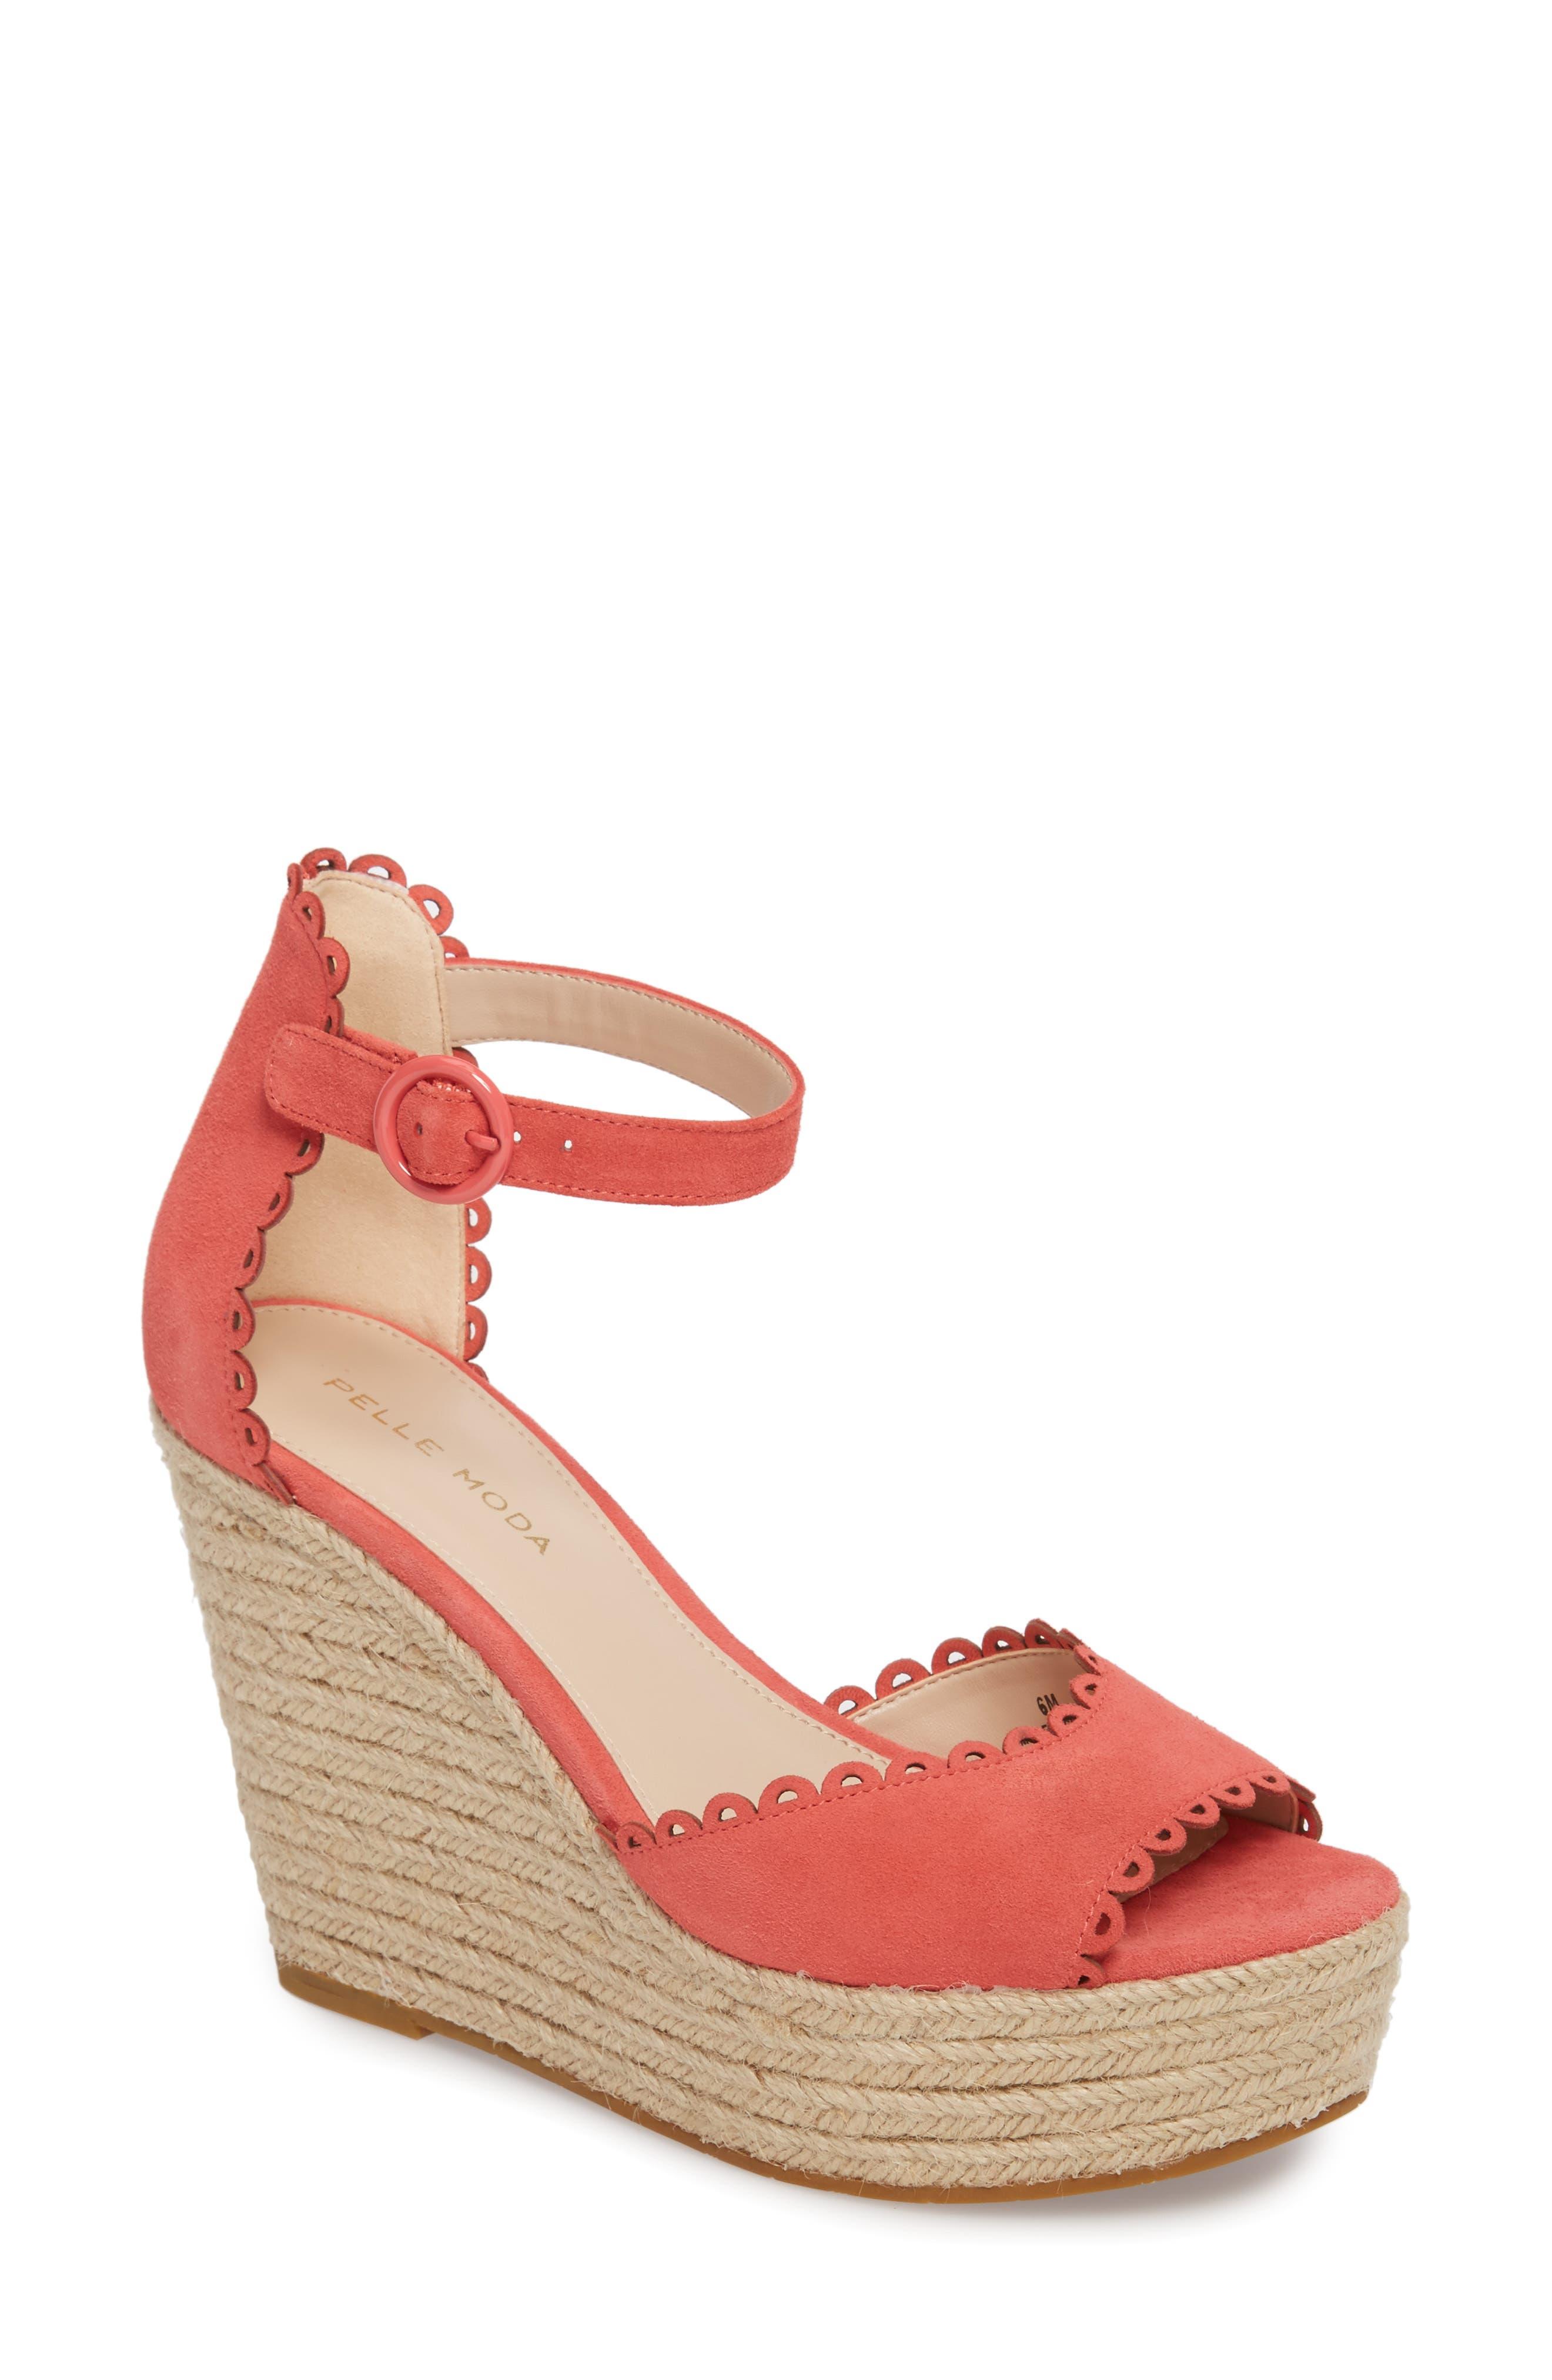 Raine Platform Espadrille Sandal,                         Main,                         color, Flamingo Suede